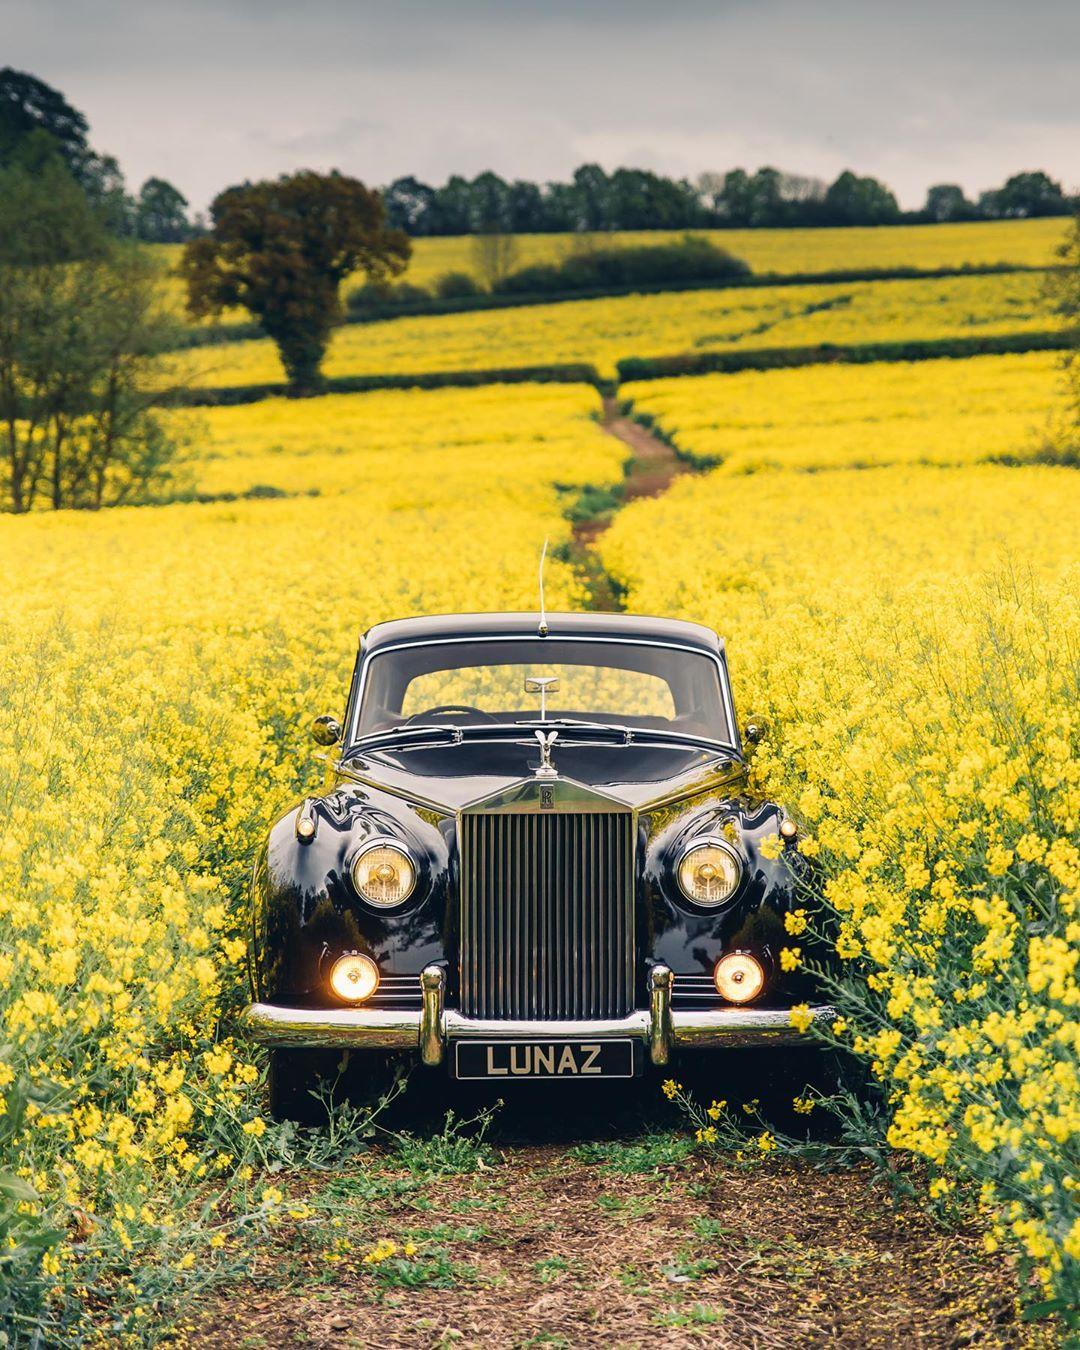 Rolls Royce Cloud. Courtesy: Lunaz Design